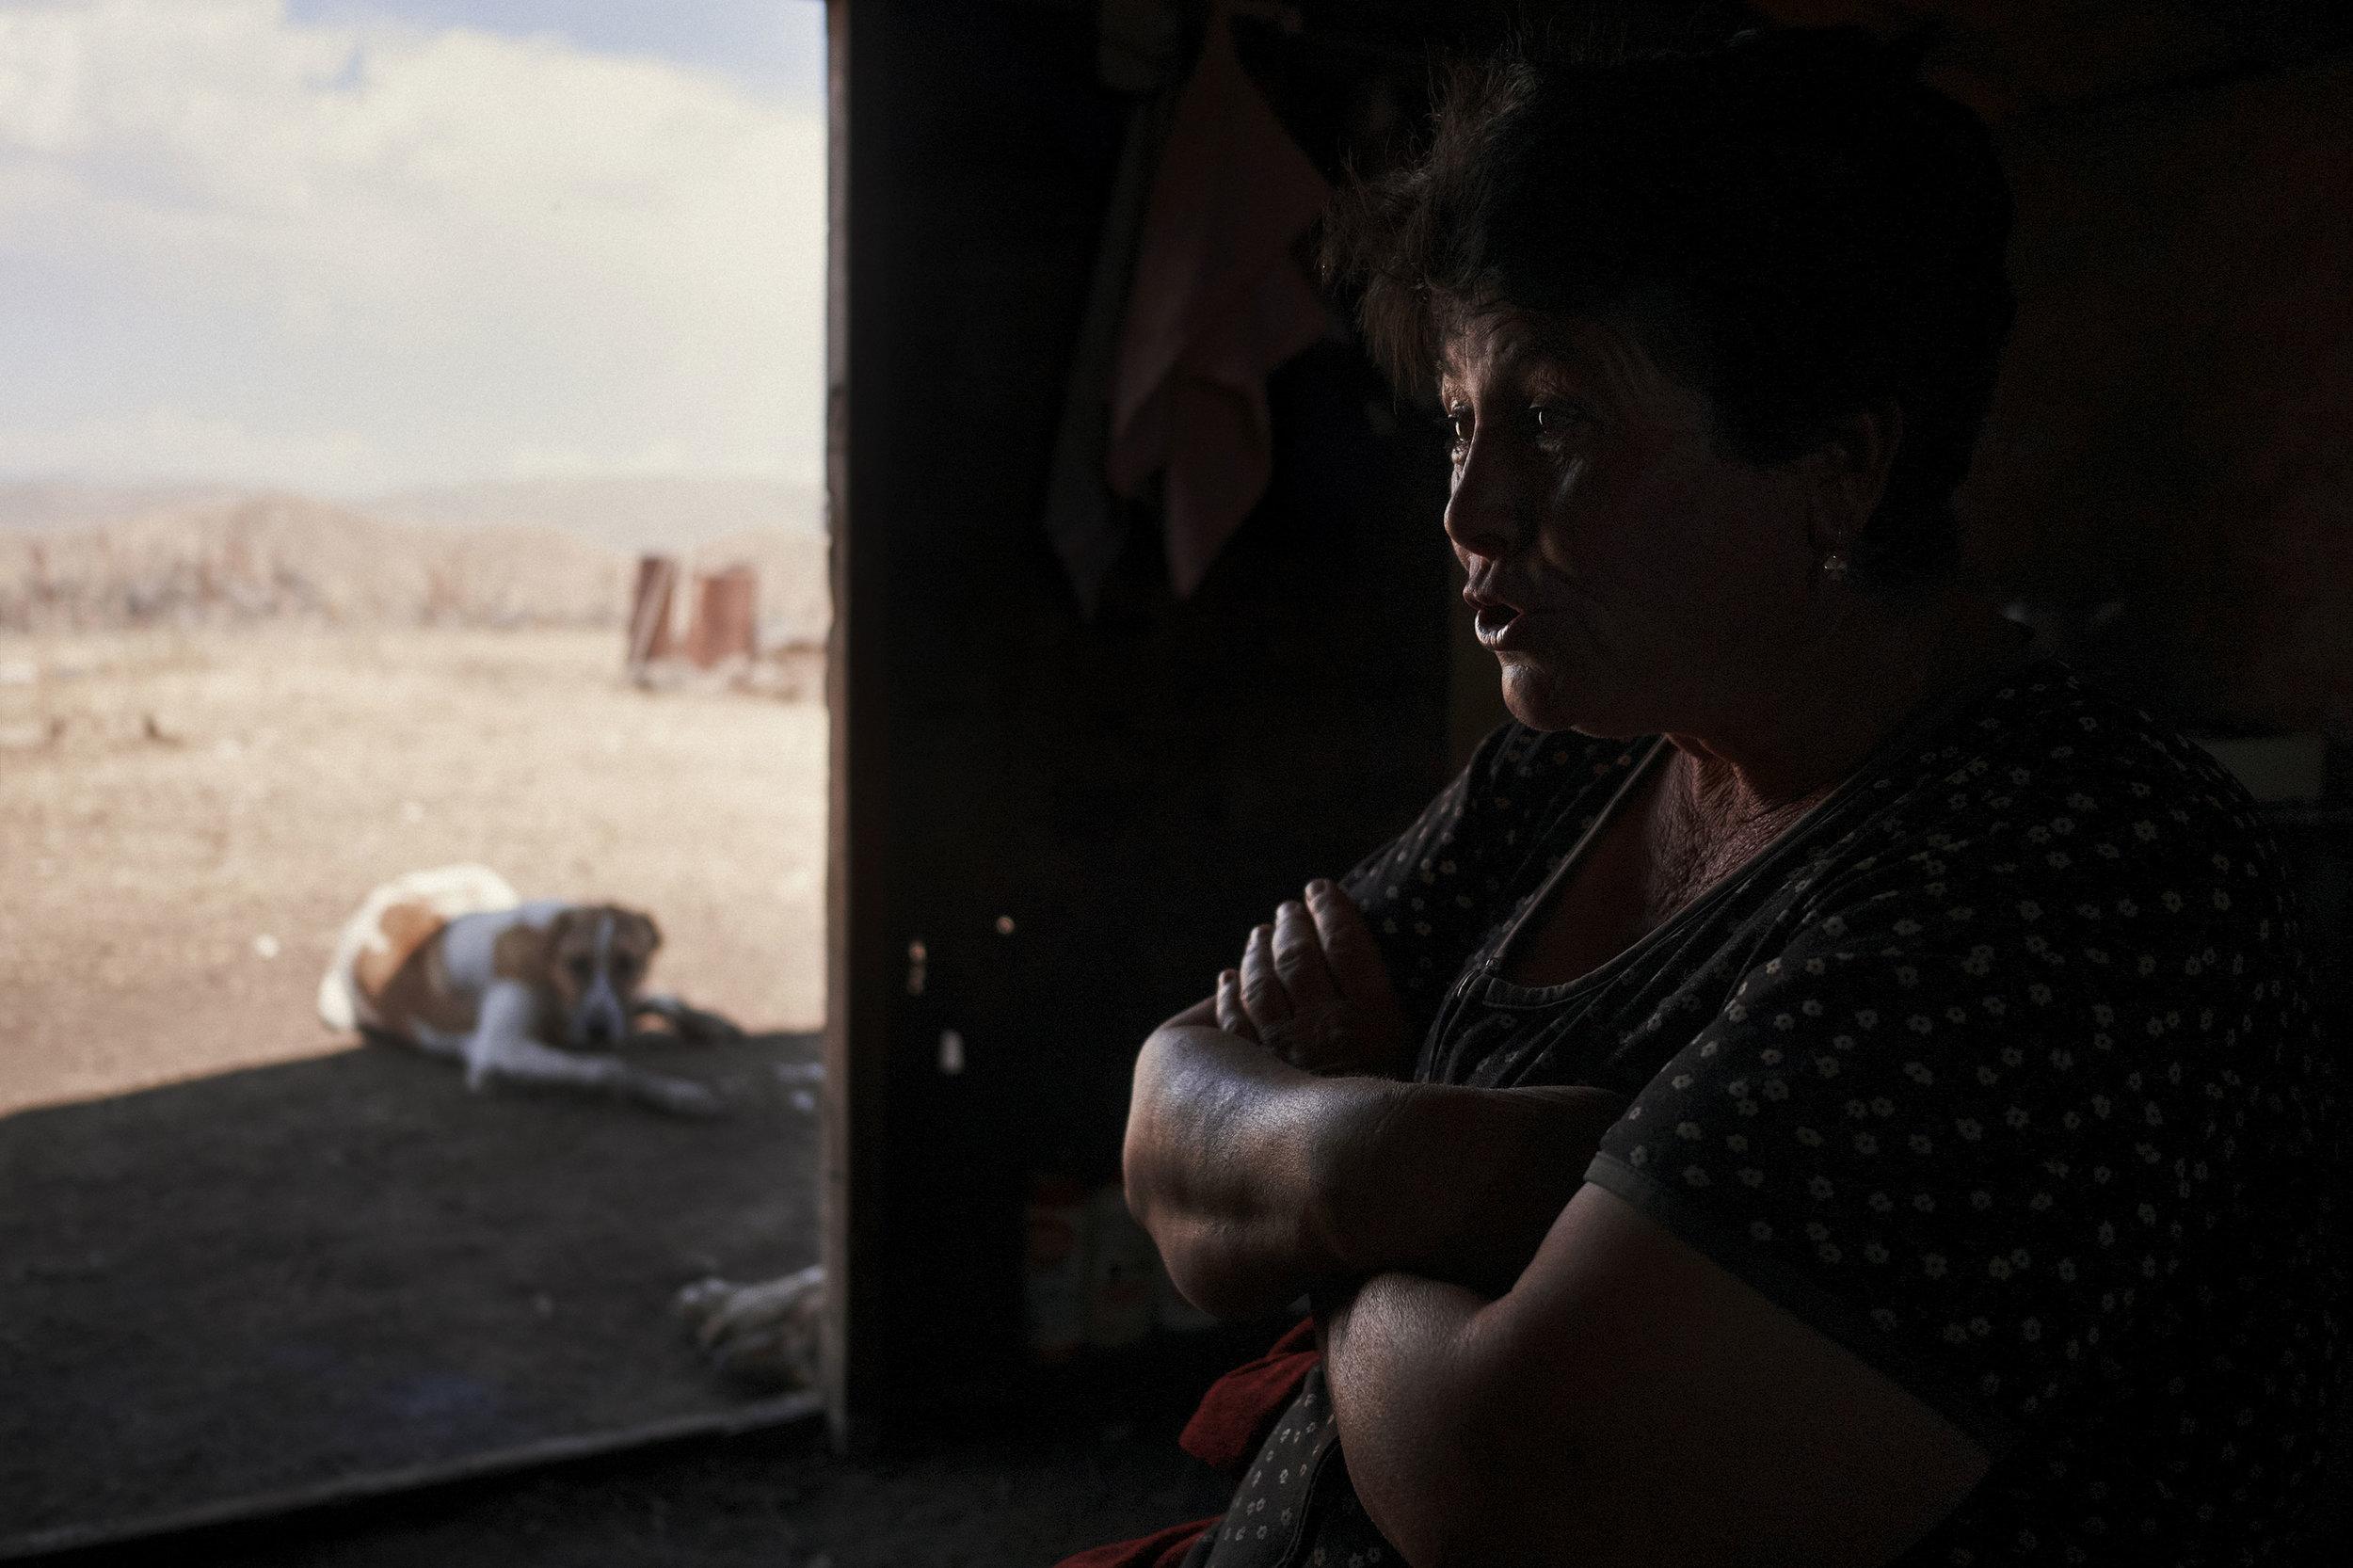 Armenia-Vayots-Sar-shepherd-woman-inside-hut